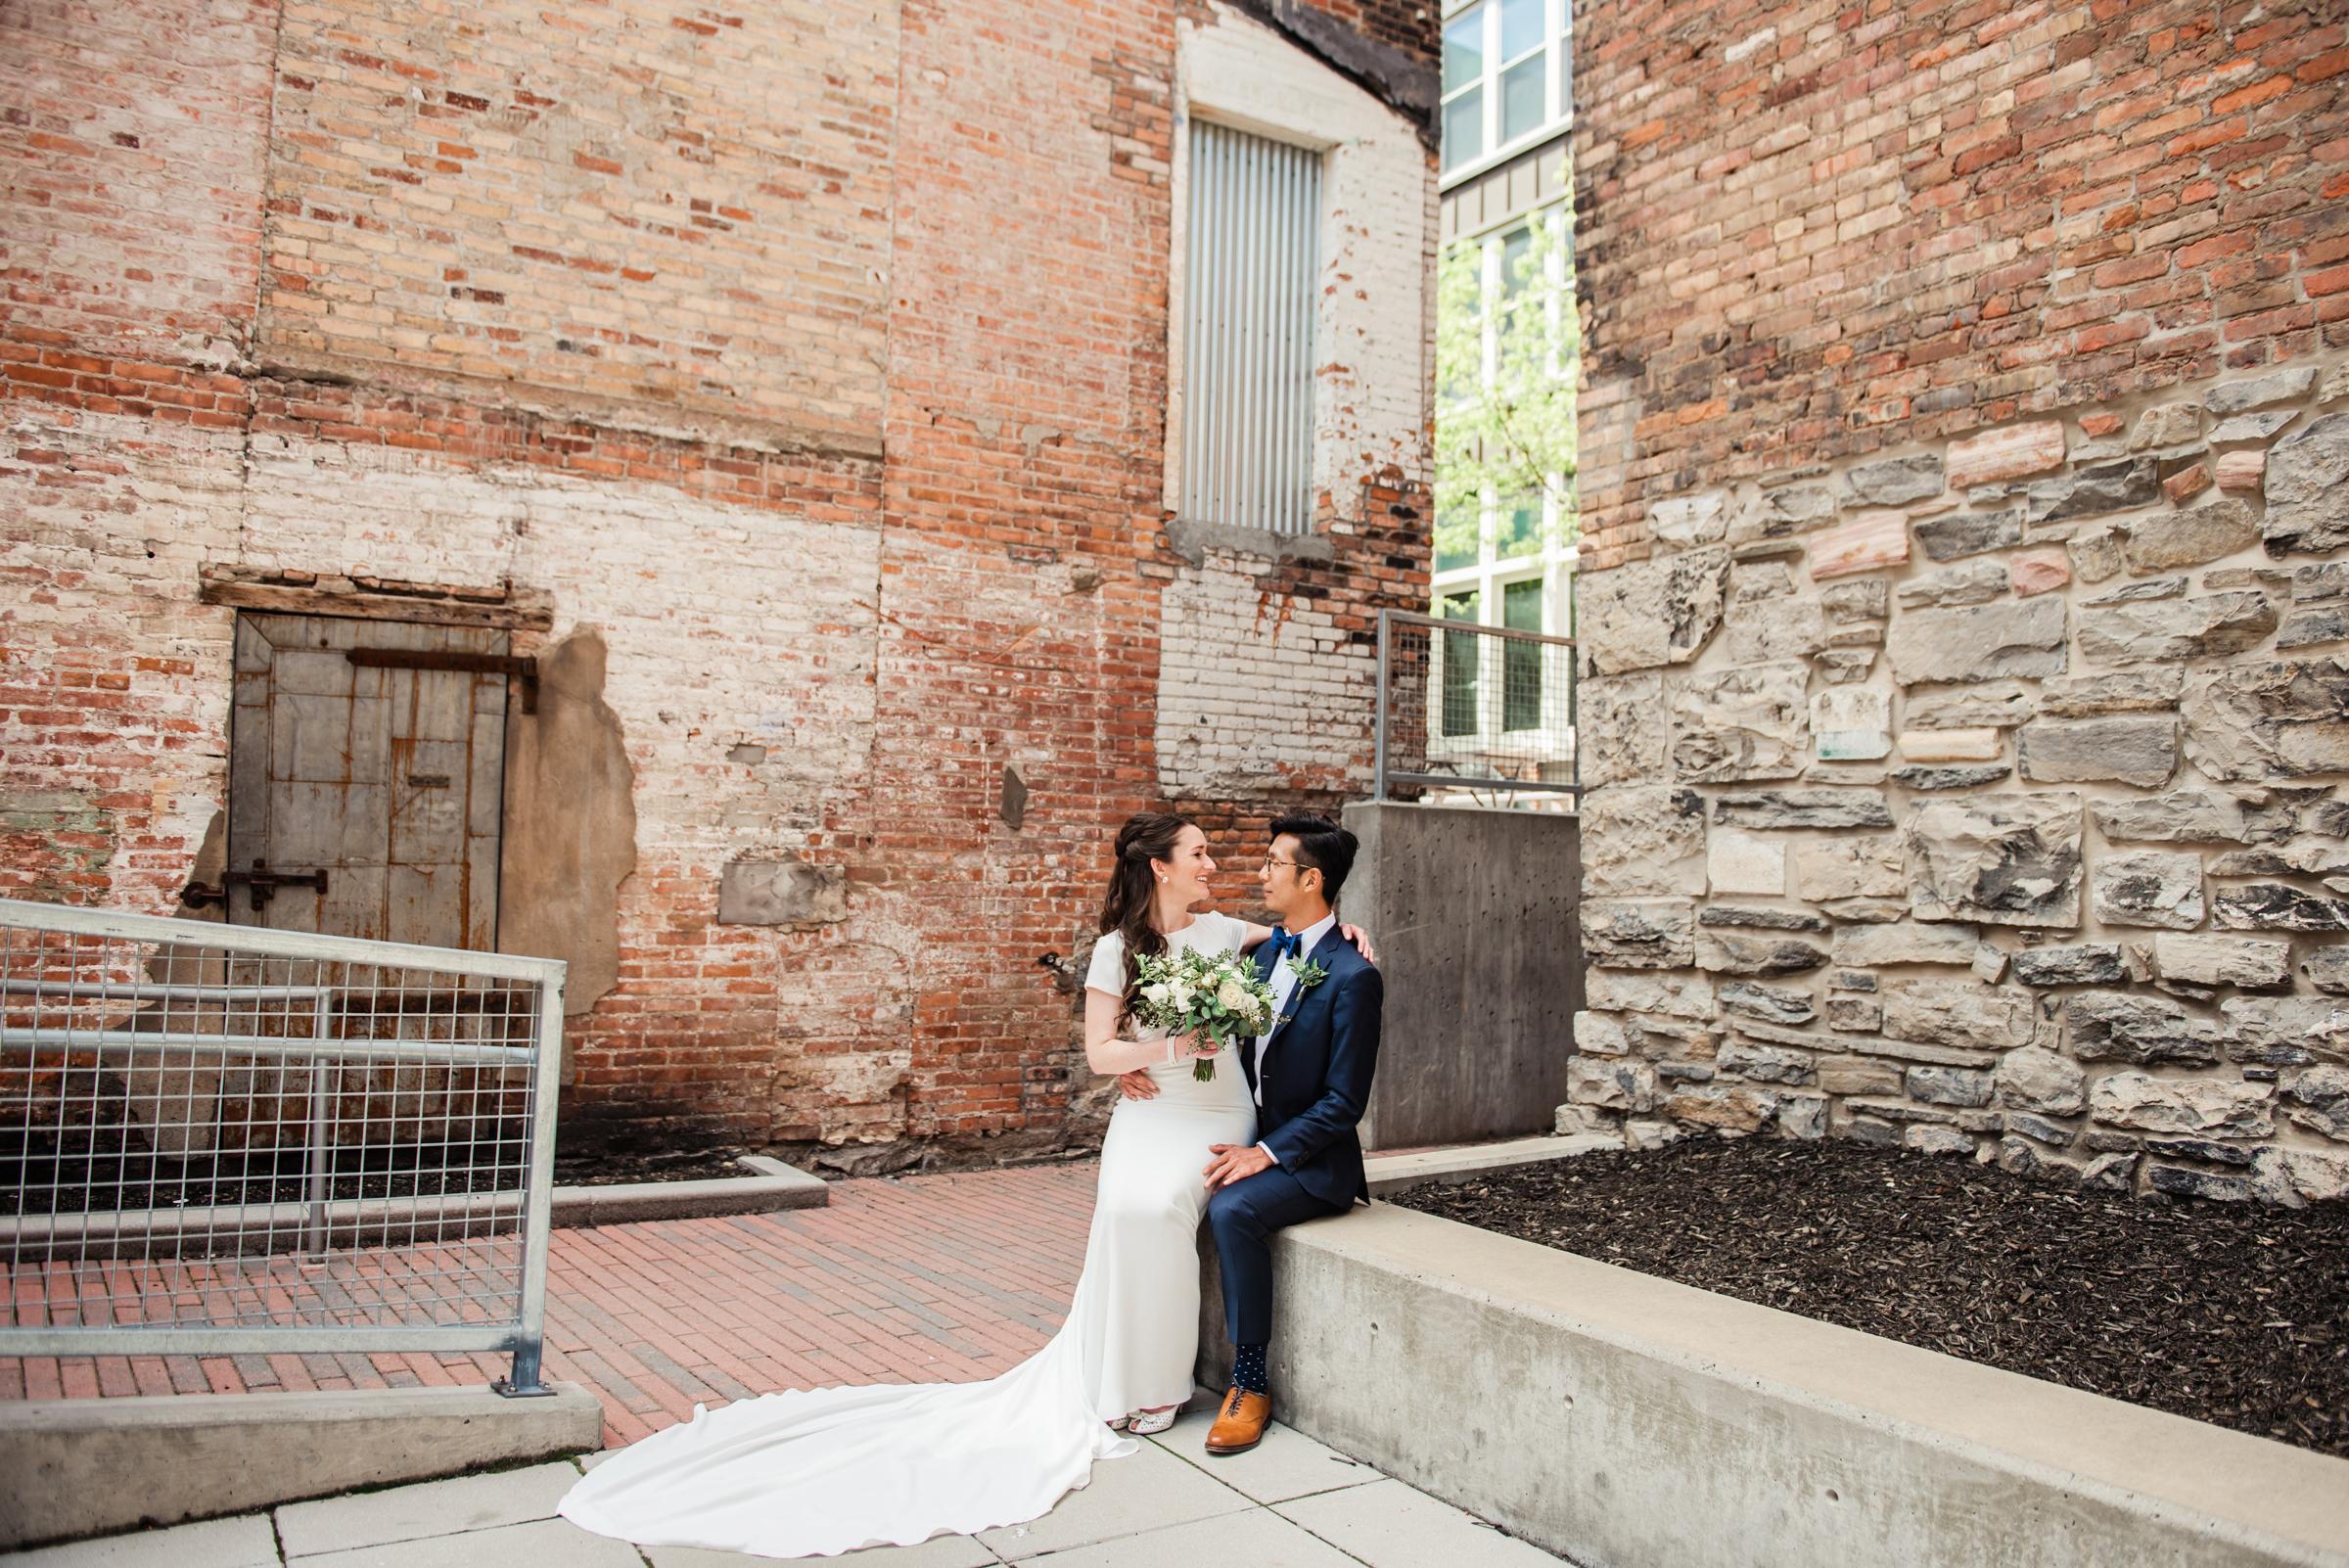 SKY_Armory_Syracuse_Wedding_JILL_STUDIO_Rochester_NY_Photographer_DSC_5372.jpg